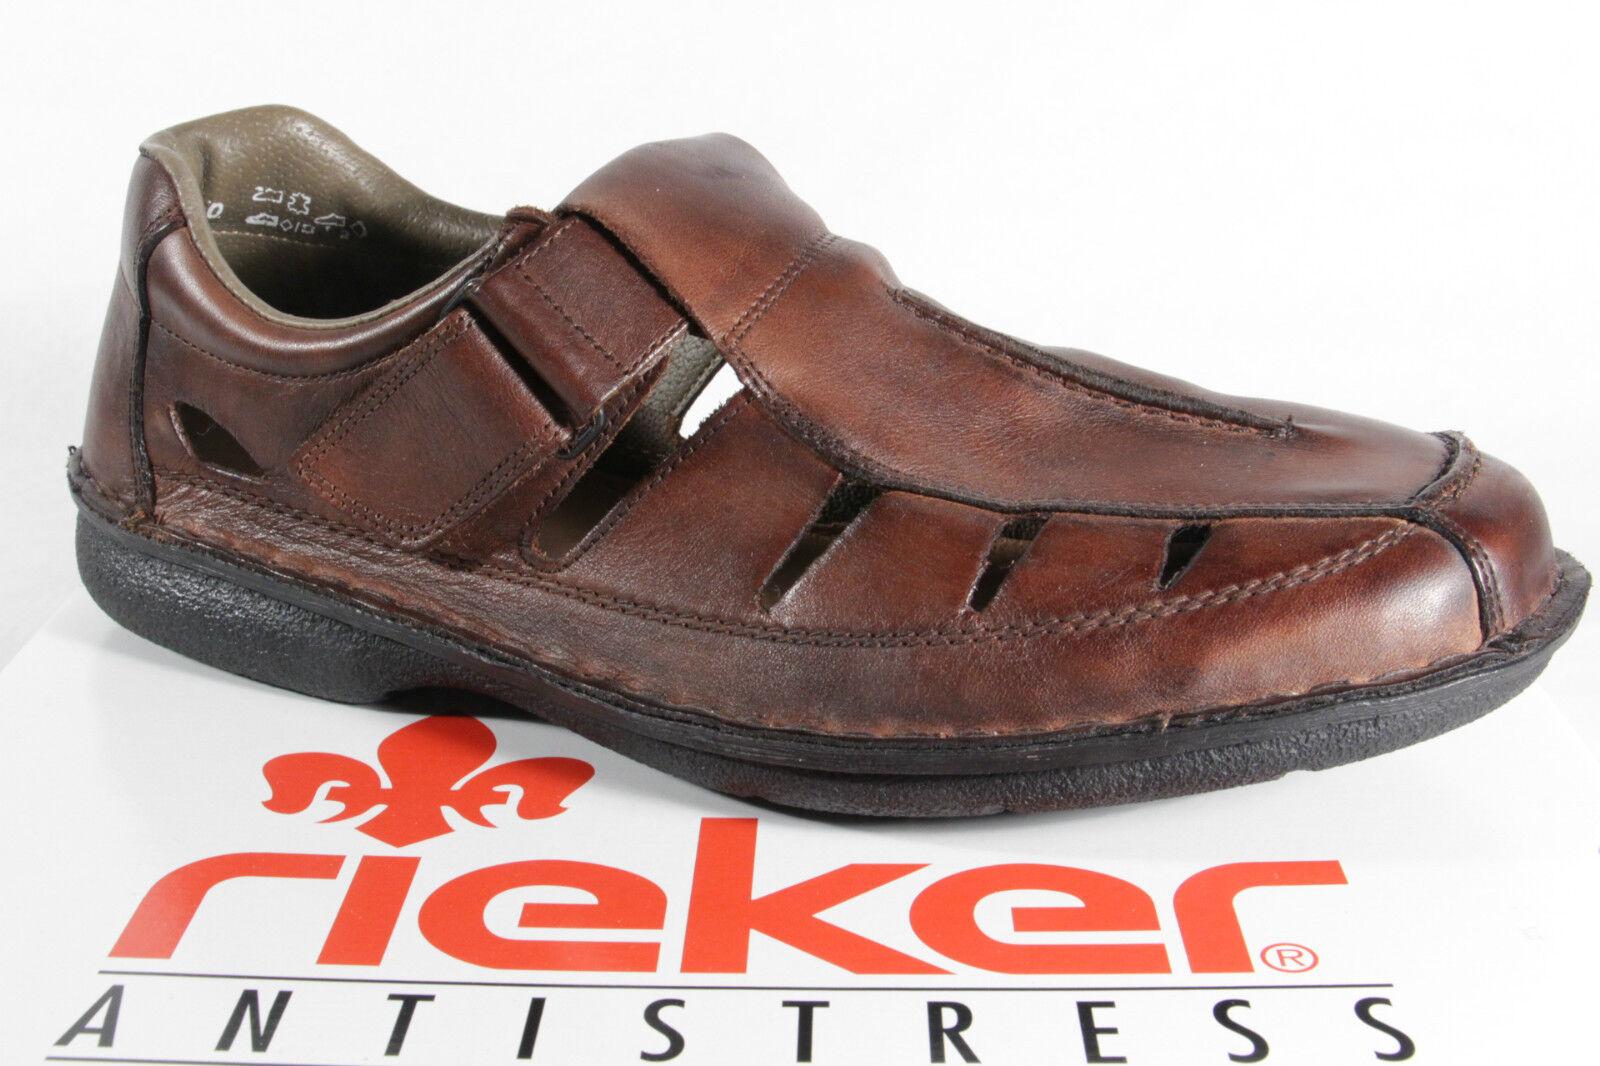 Rieker weiche Slipper Sneakers Halbschuhe braun weiche Rieker Lederinnensohle   NEU e73117